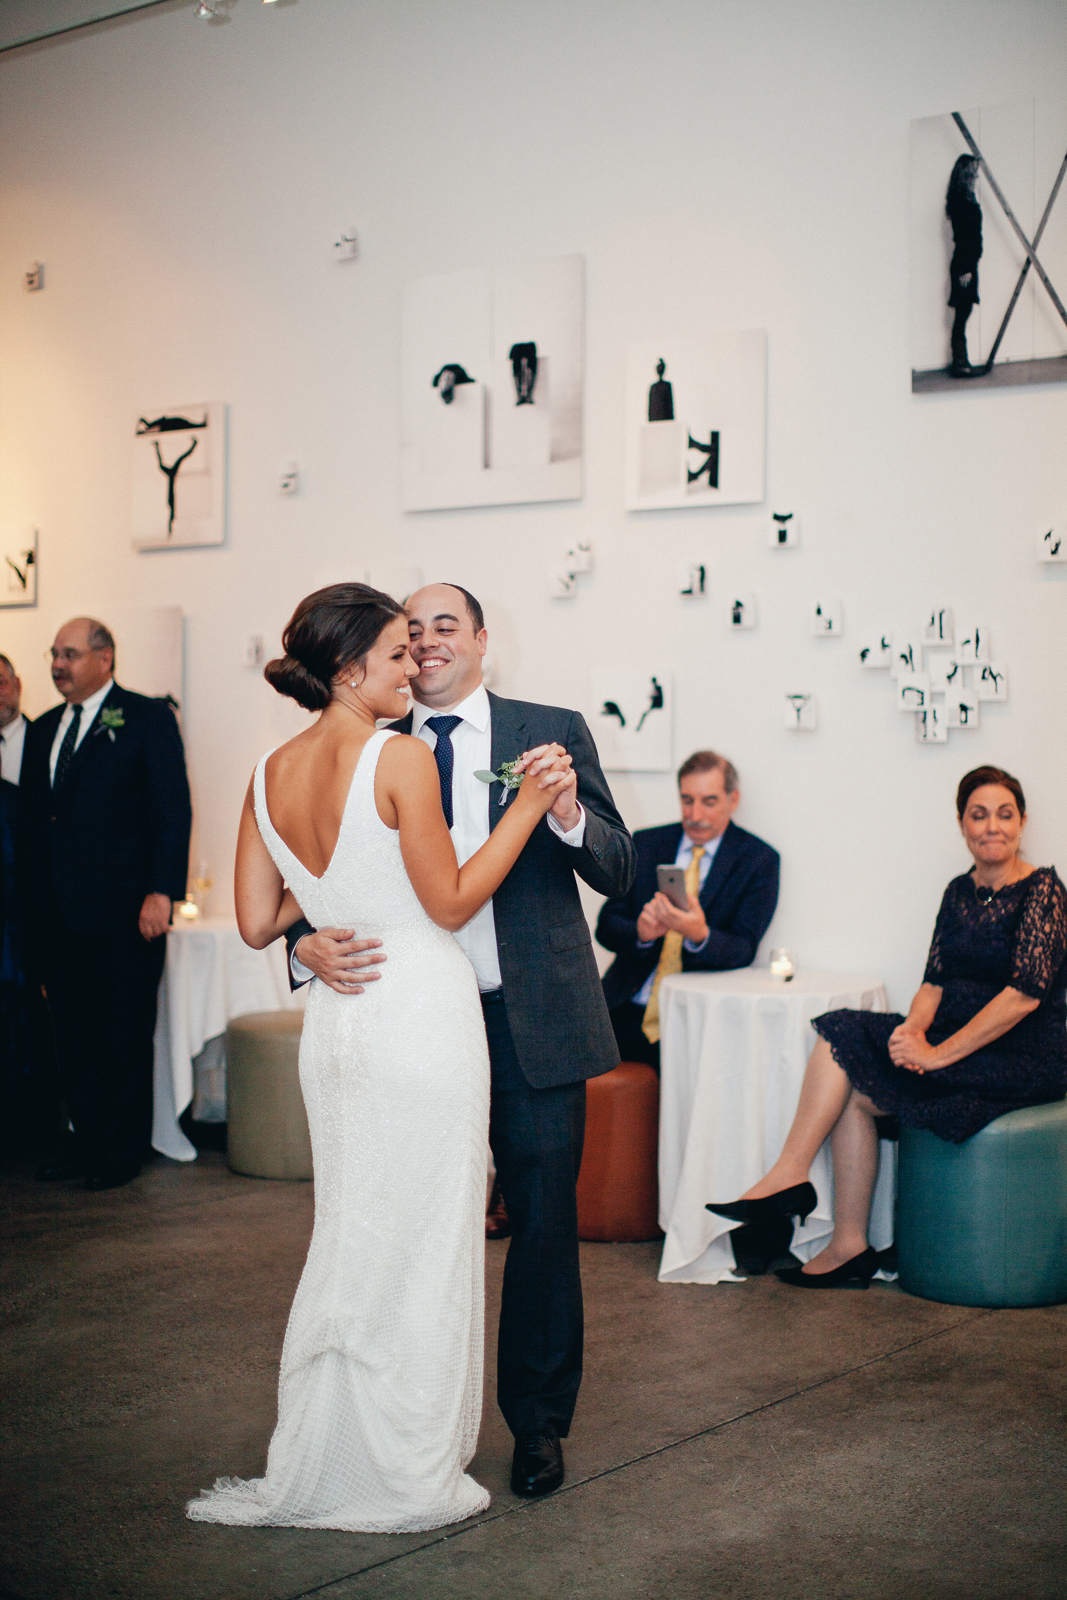 temple_emmanuel_jewish_wedding_san_francisco_ca_sarah_andrew_ebony_siovhan_bokeh_photography_85.jpg